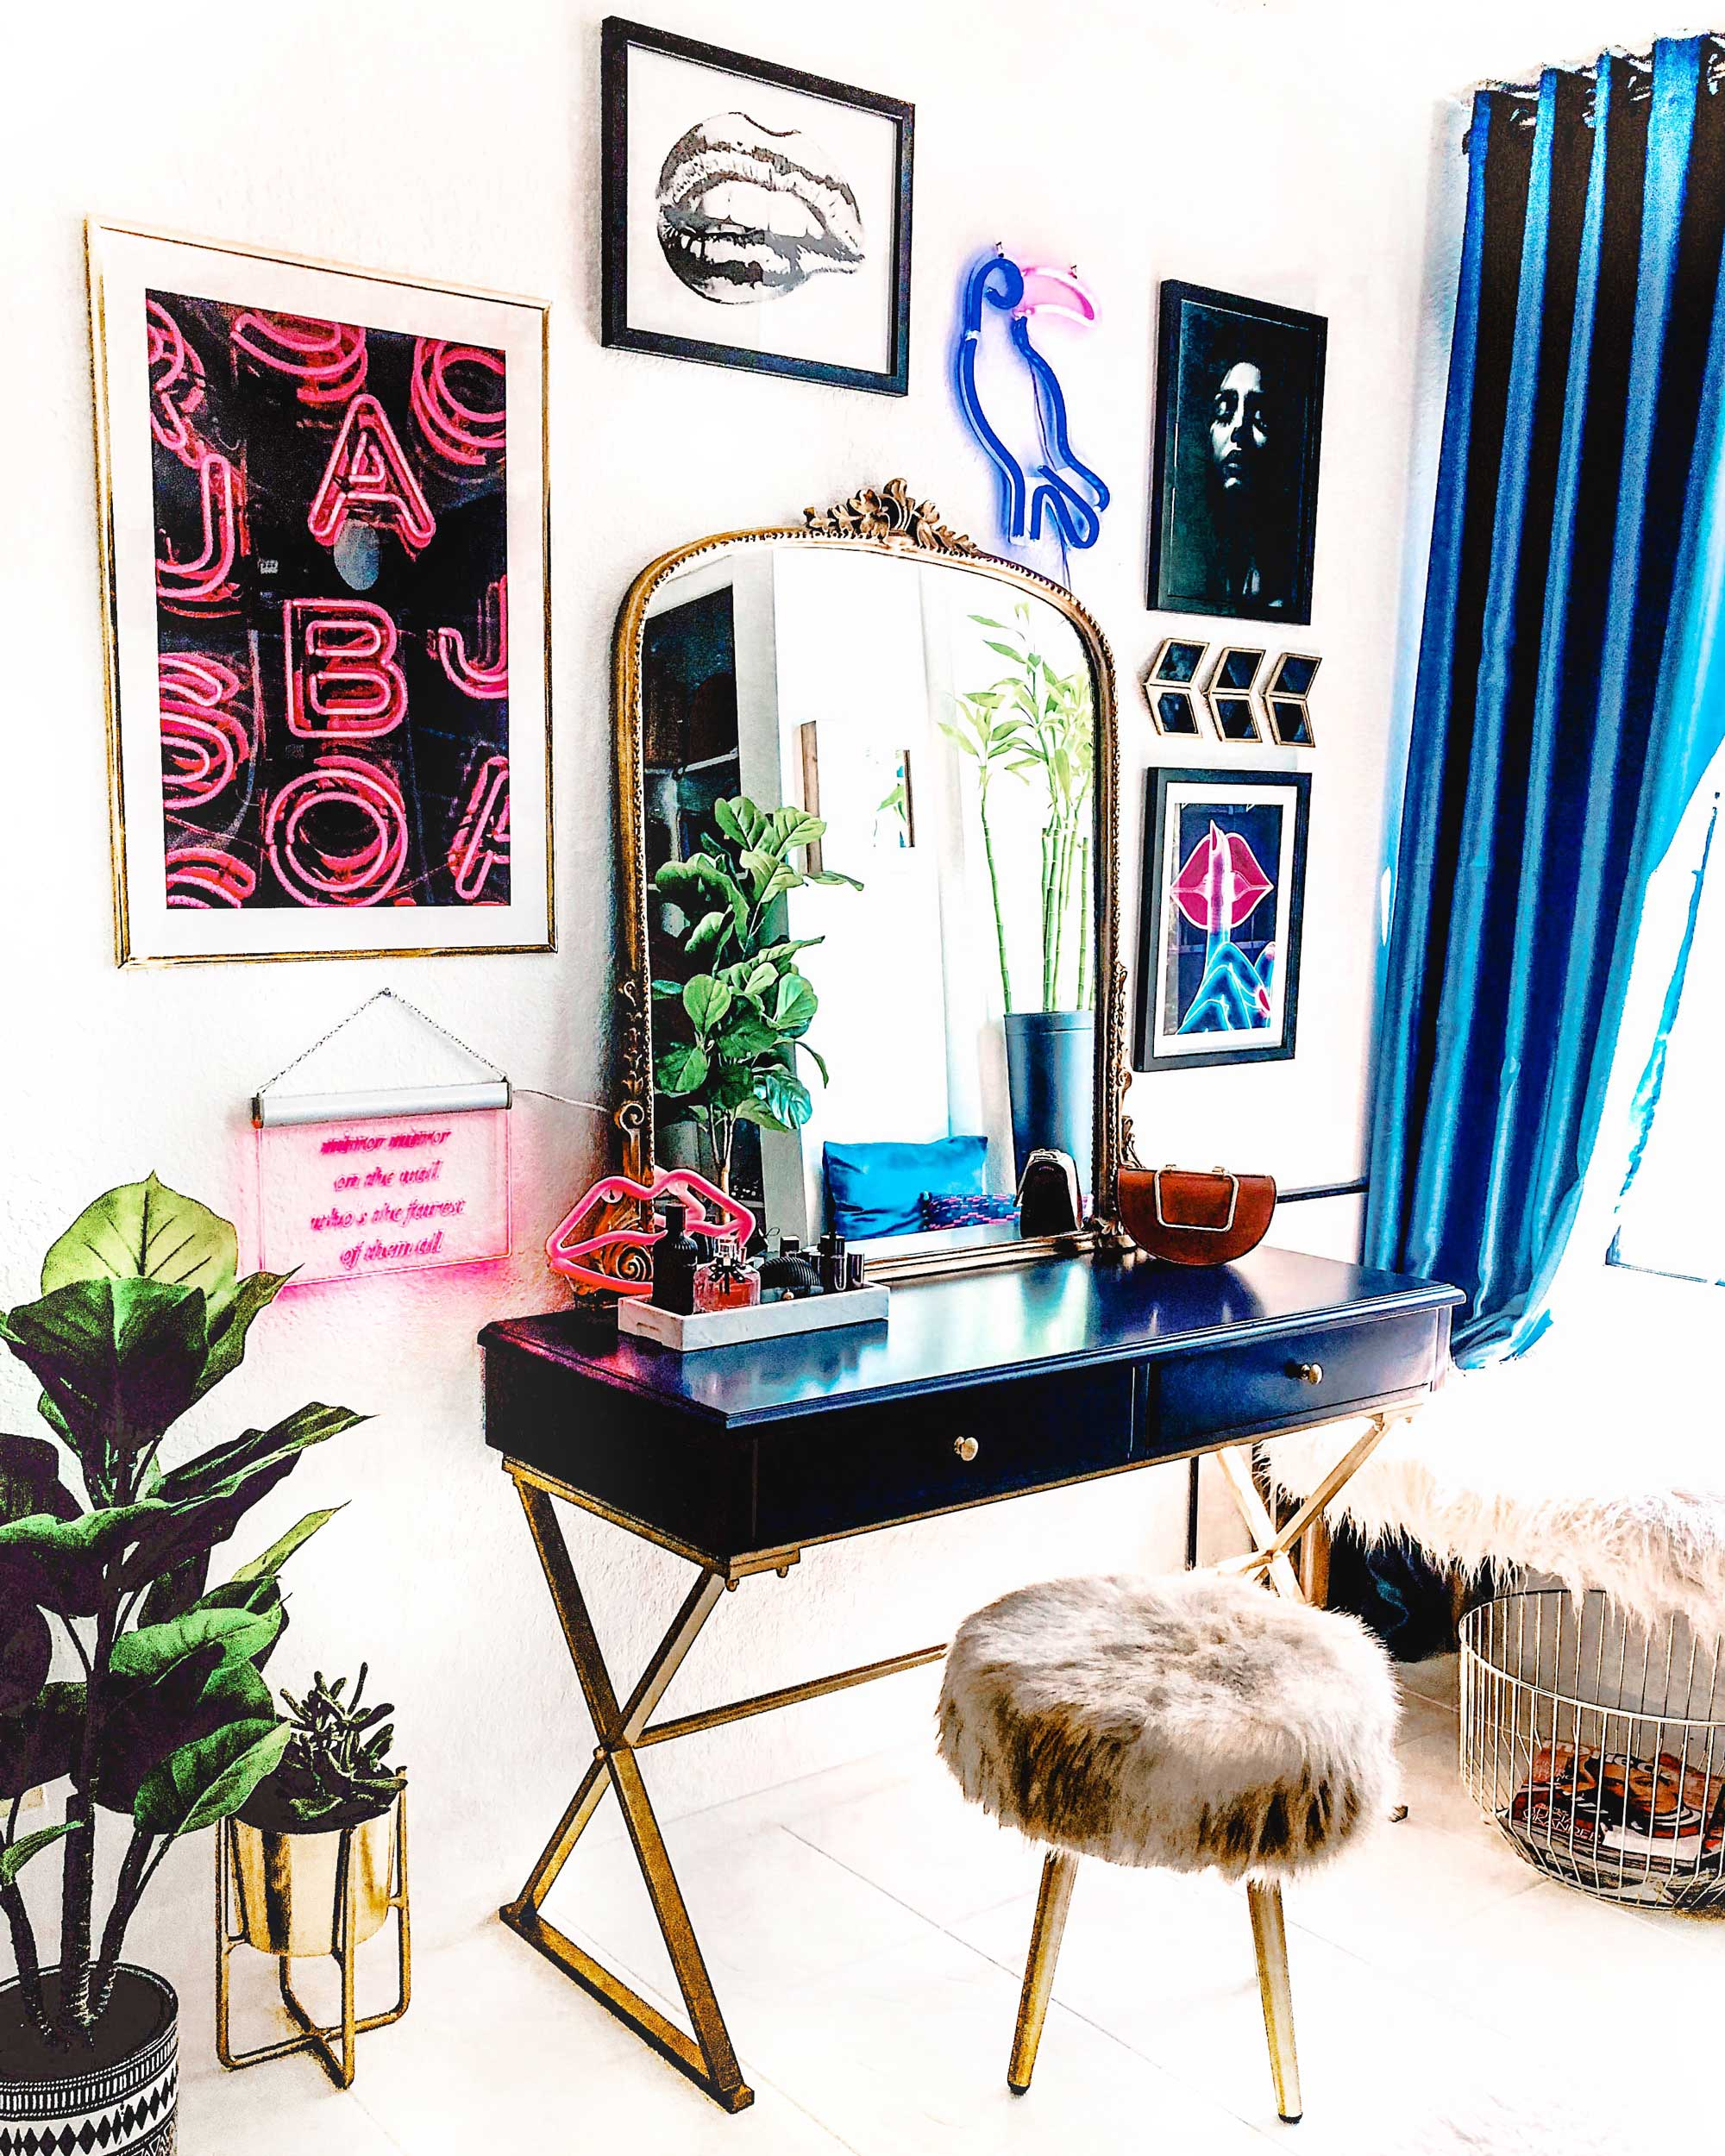 Vanity-Room-Modern Eclectic Vanity with Desenio   Free Phone and Desktop wallpapers download